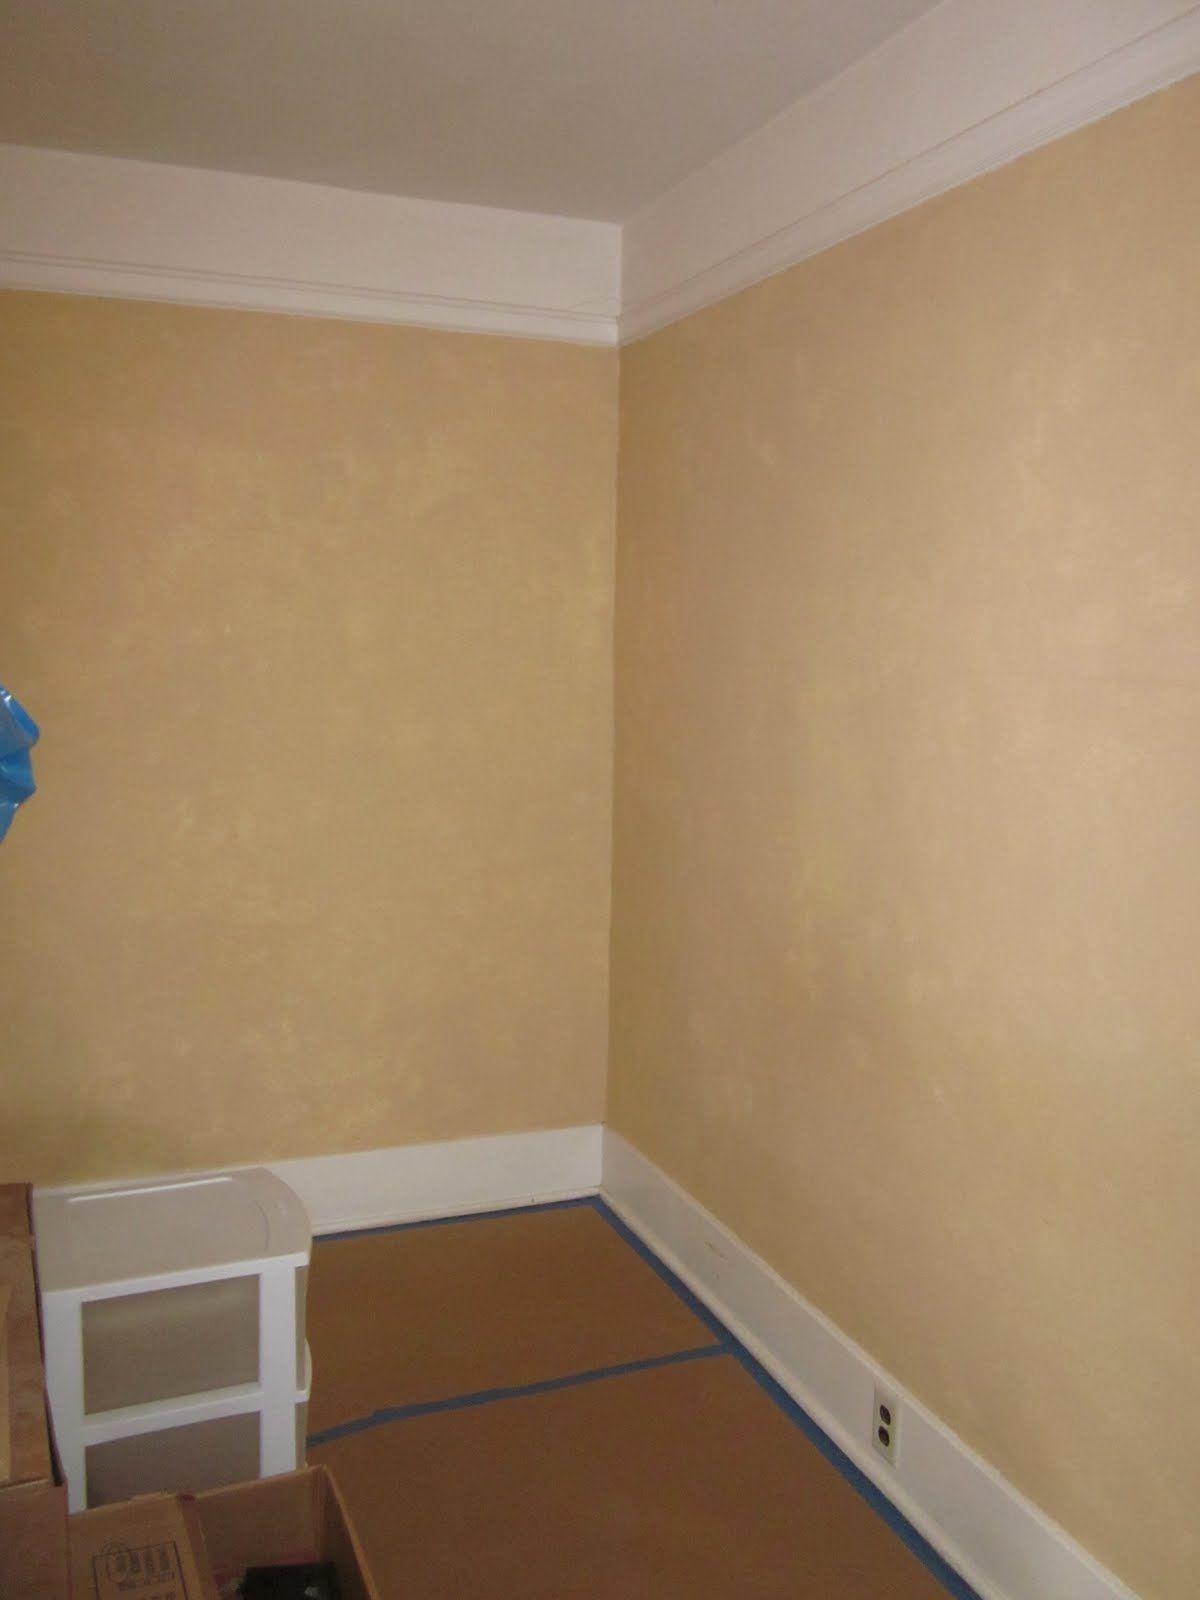 laurelhurst craftsman bungalow master bedroom paint stripping